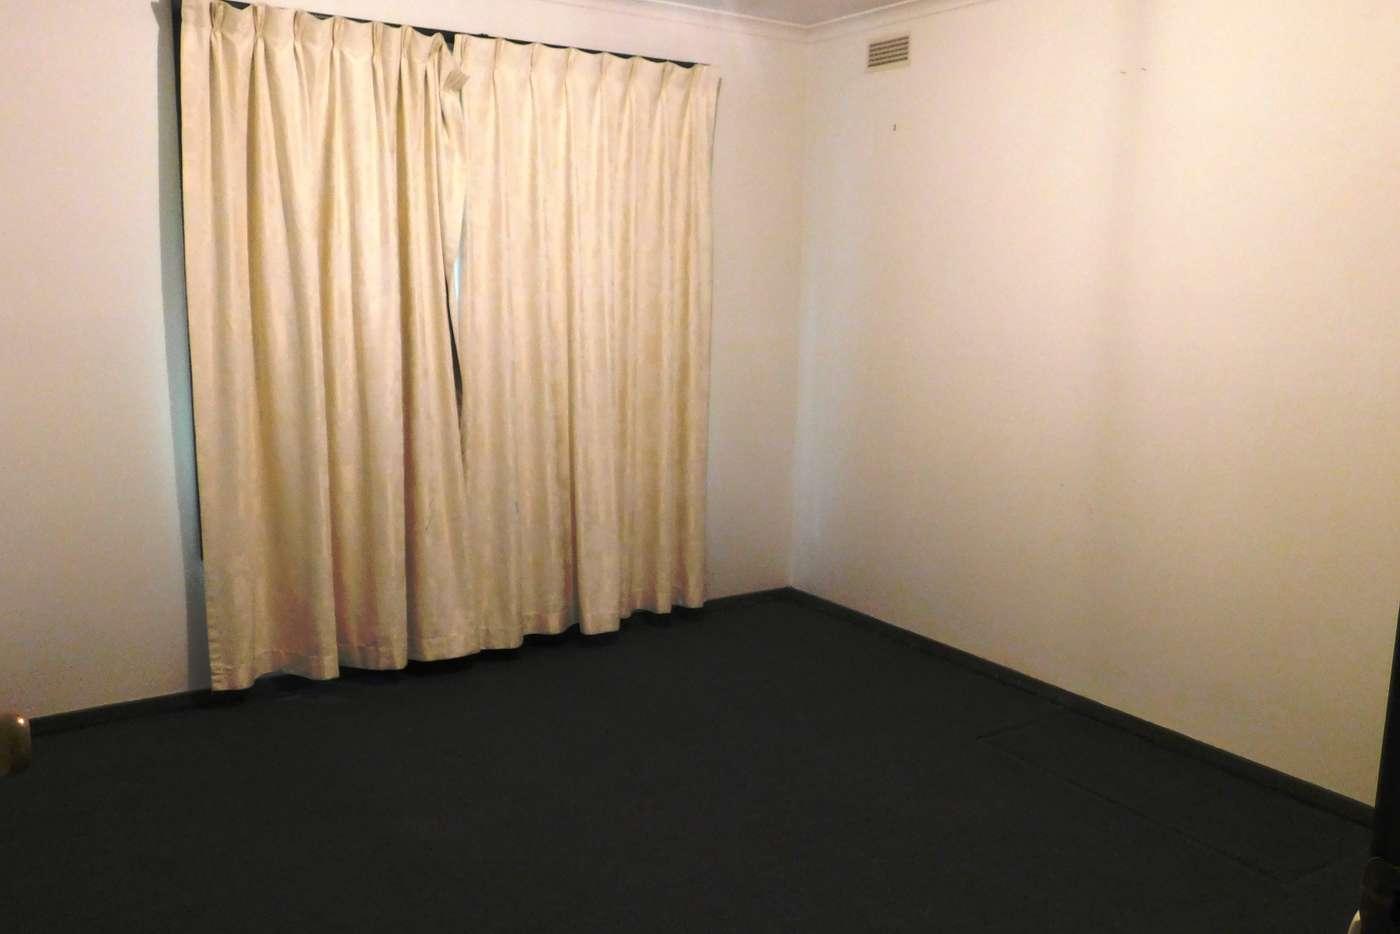 Sixth view of Homely house listing, 30 Angus Avenue, Wodonga VIC 3690